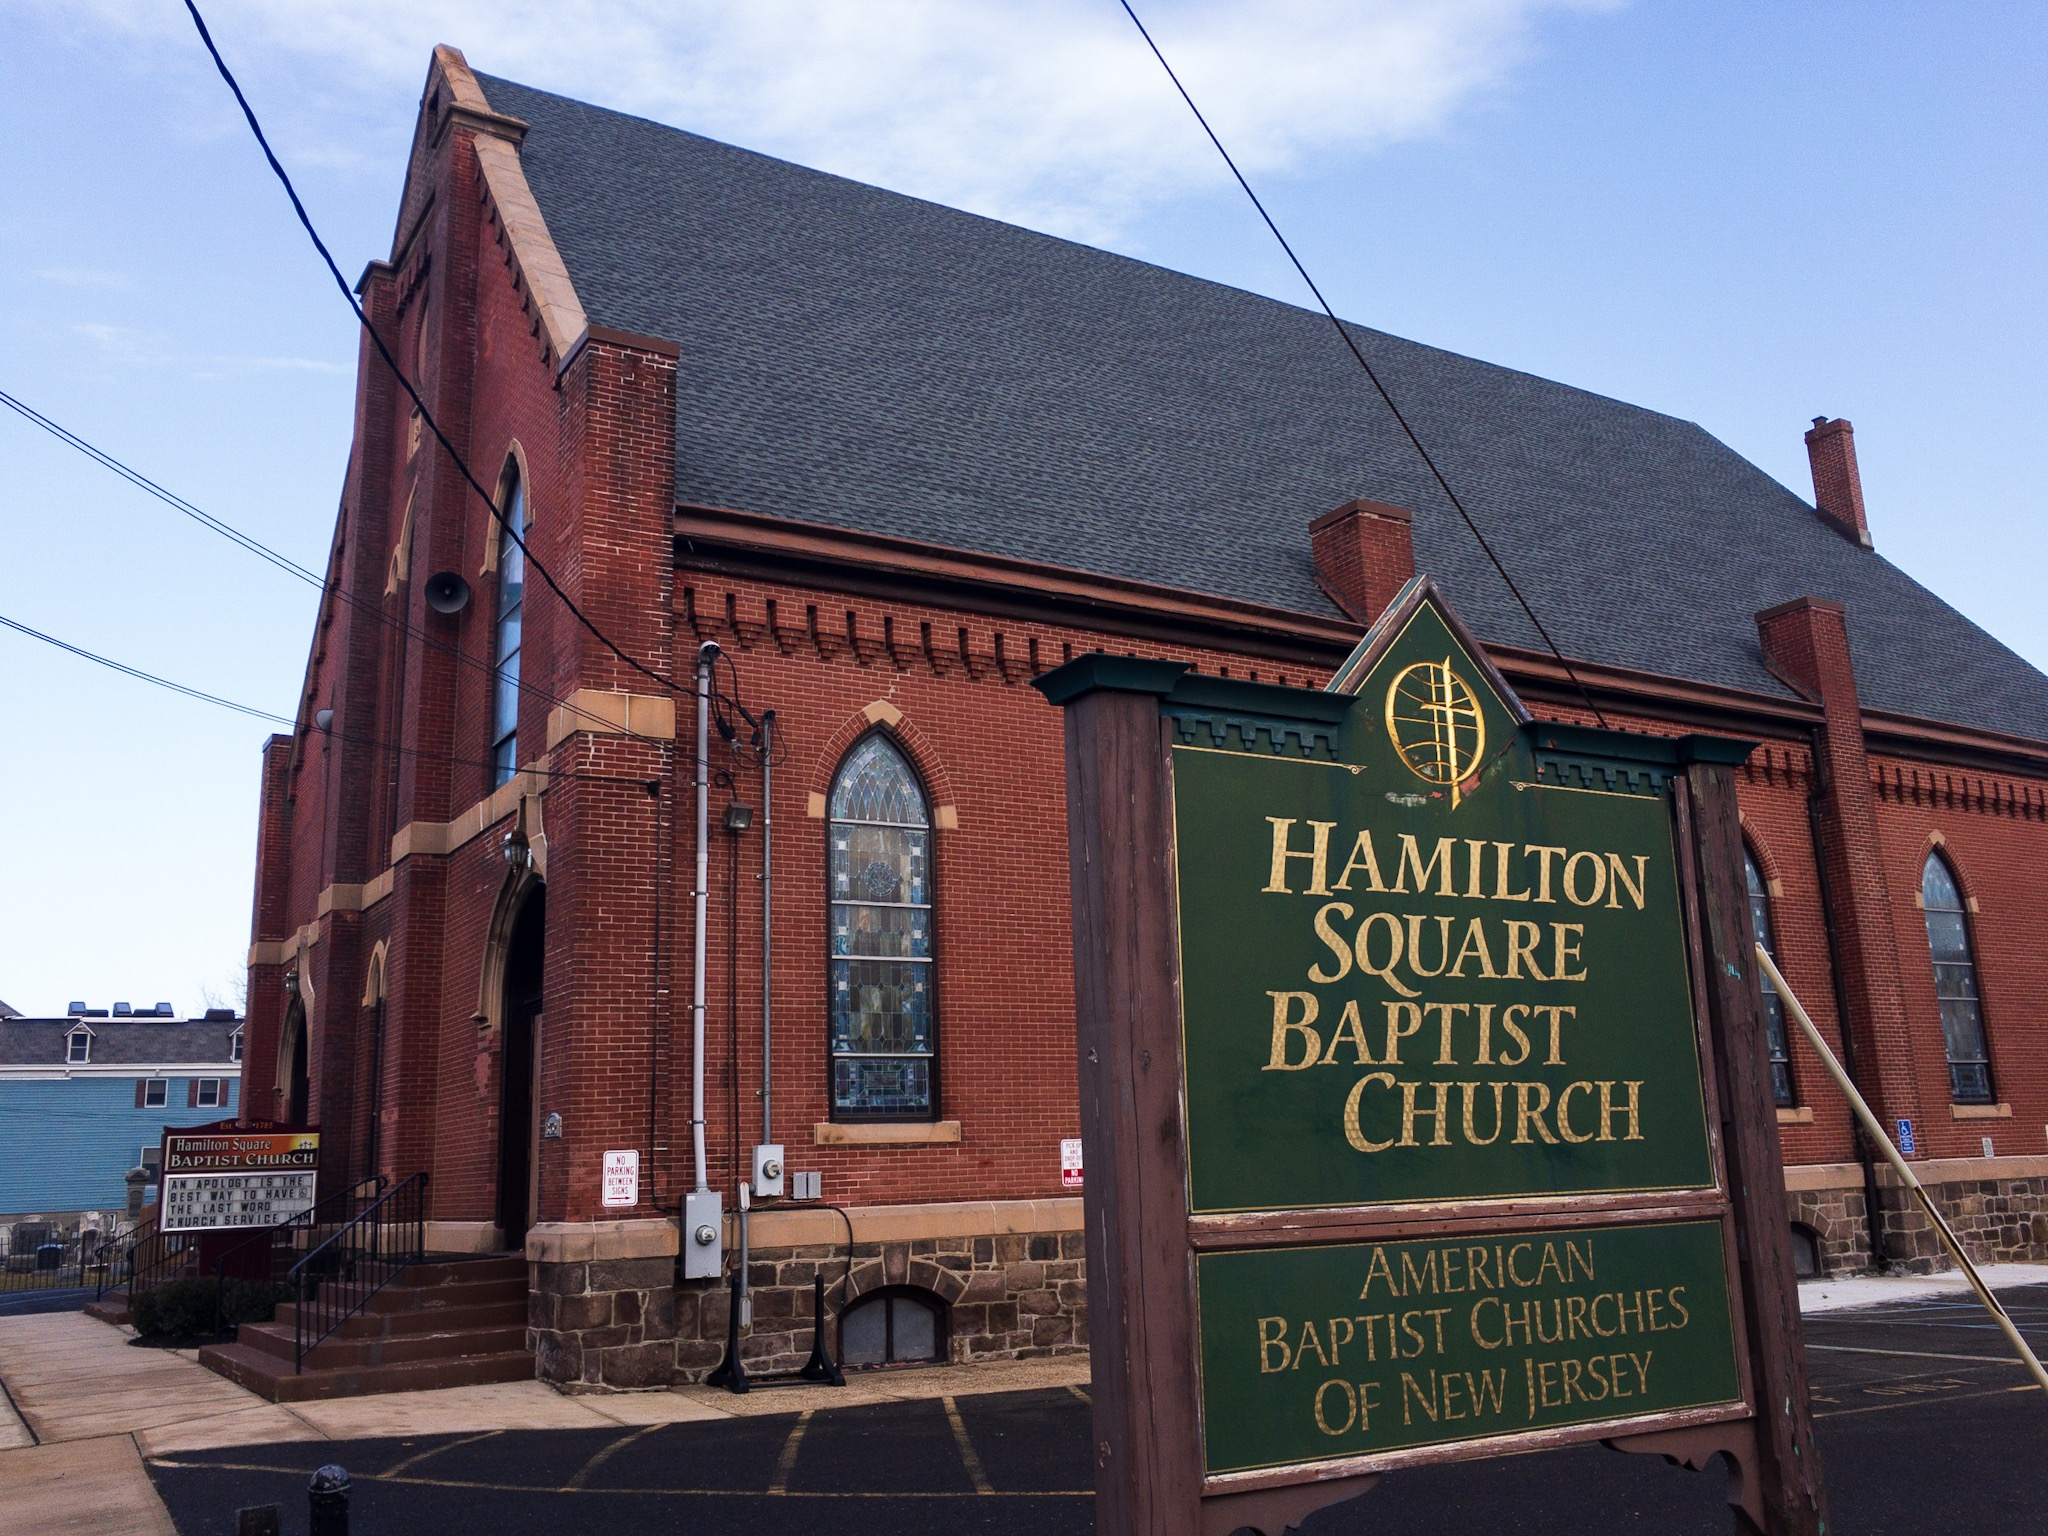 Hamilton Square Baptist Church